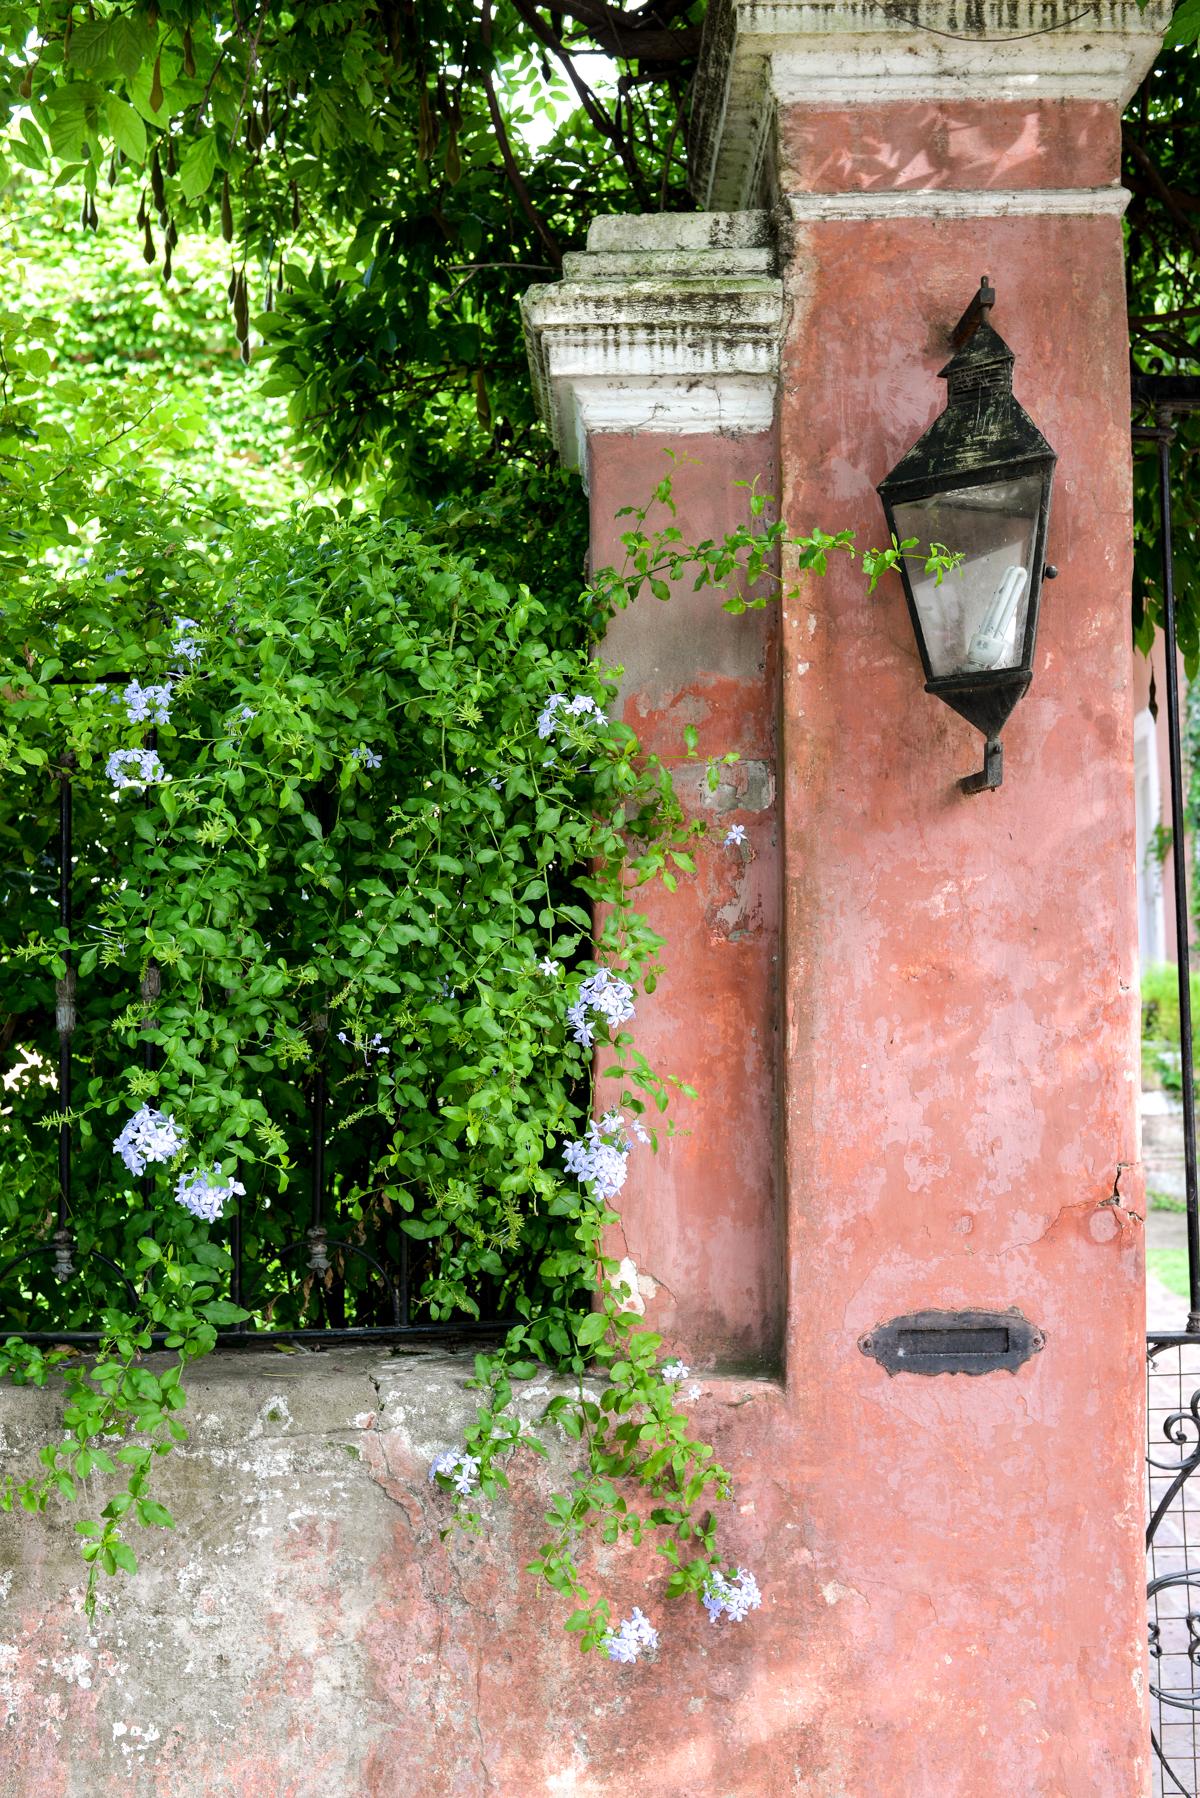 Stacie-Flinner-San-Isidro-Hotel-Del-Casco-48